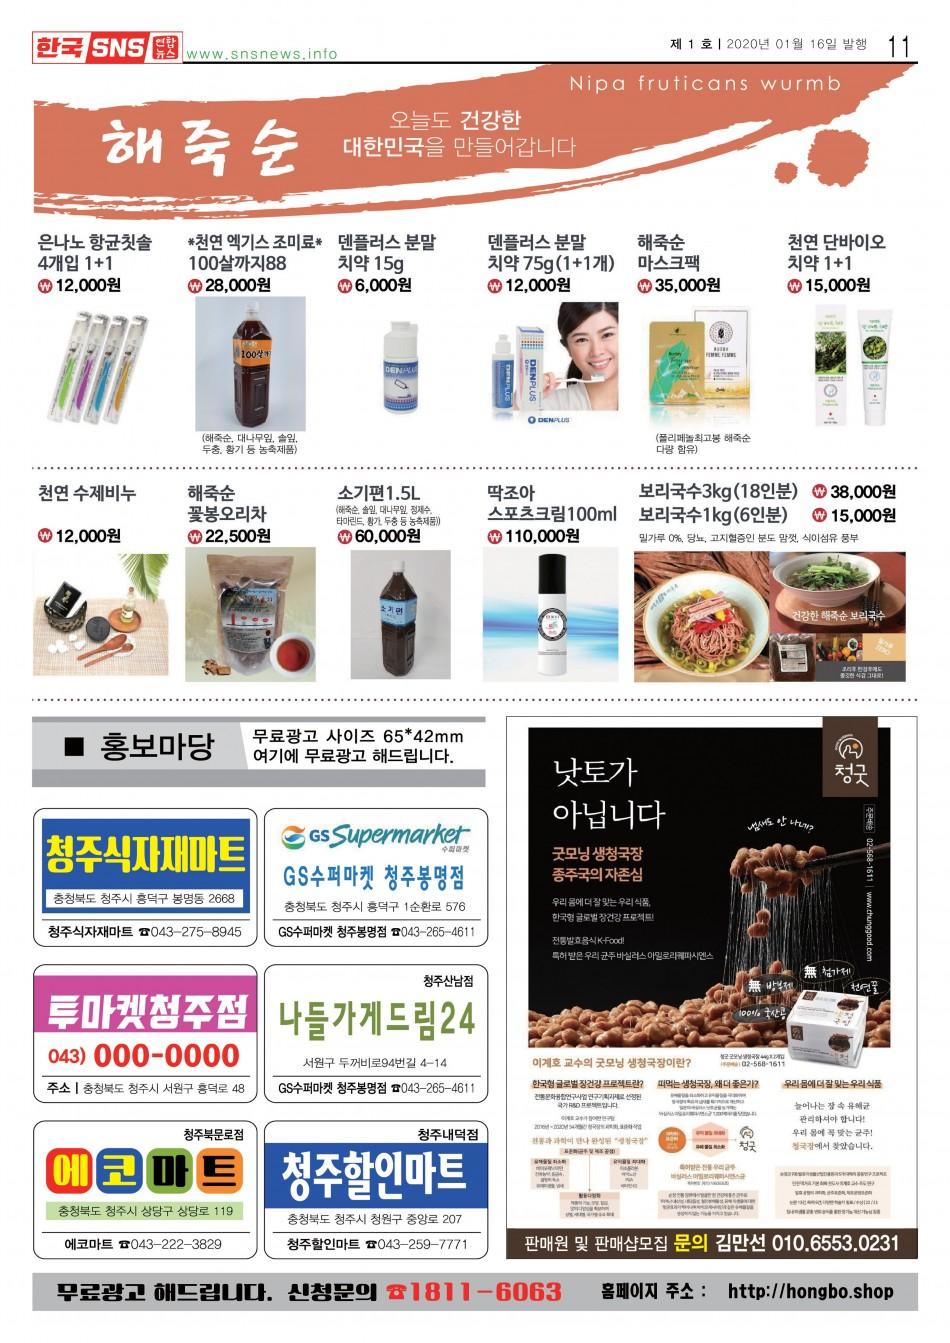 news_11.jpg